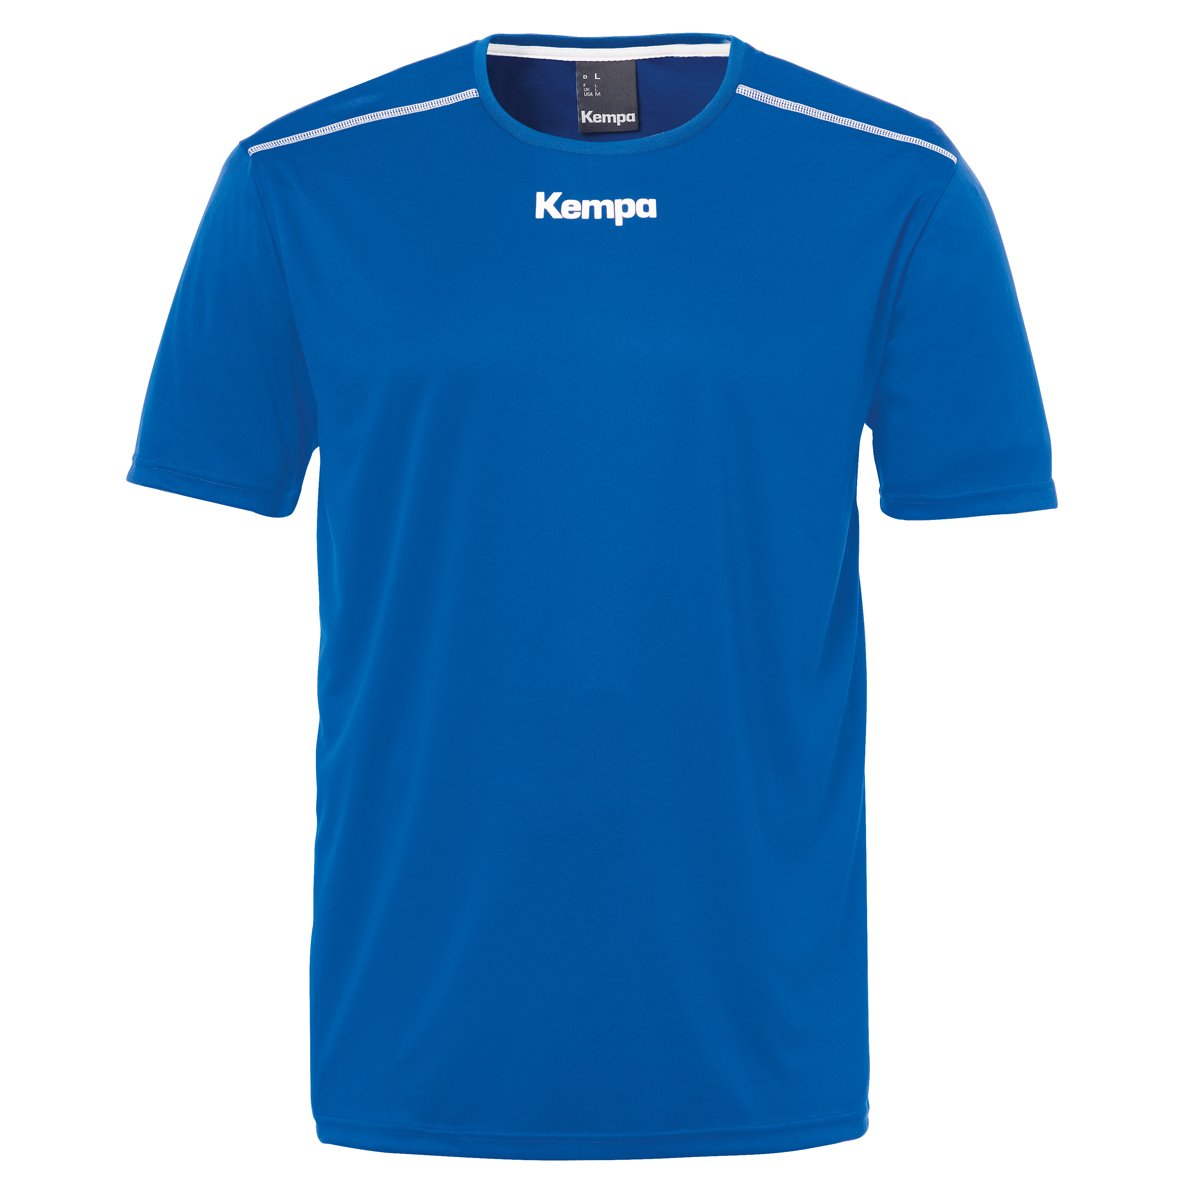 Kempa Poly Camiseta, Hombre, Verde, M